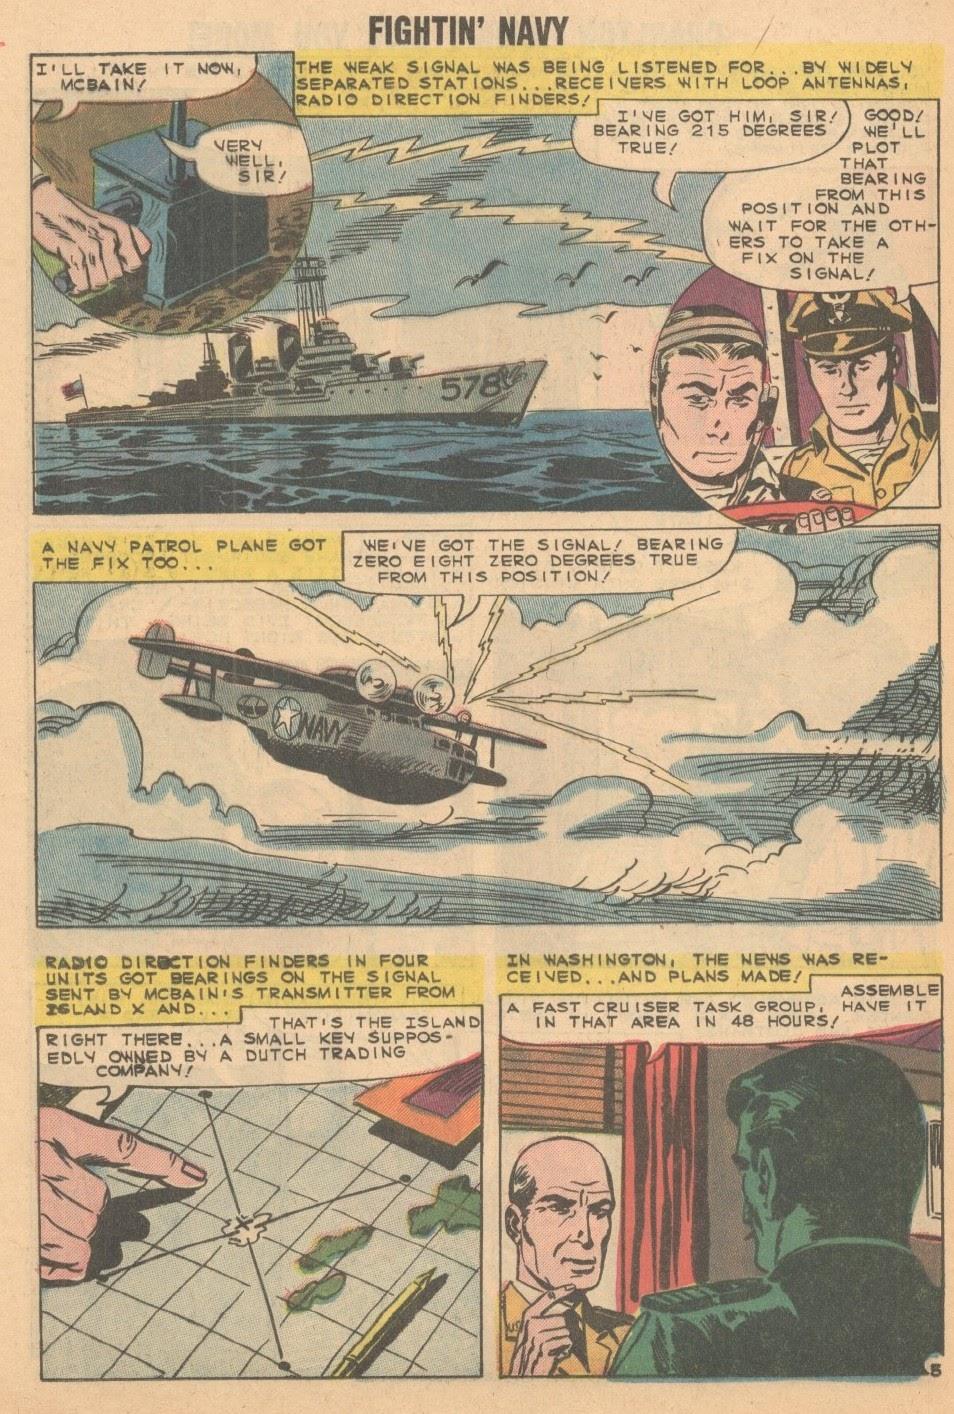 Read online Fightin' Navy comic -  Issue #93 - 20